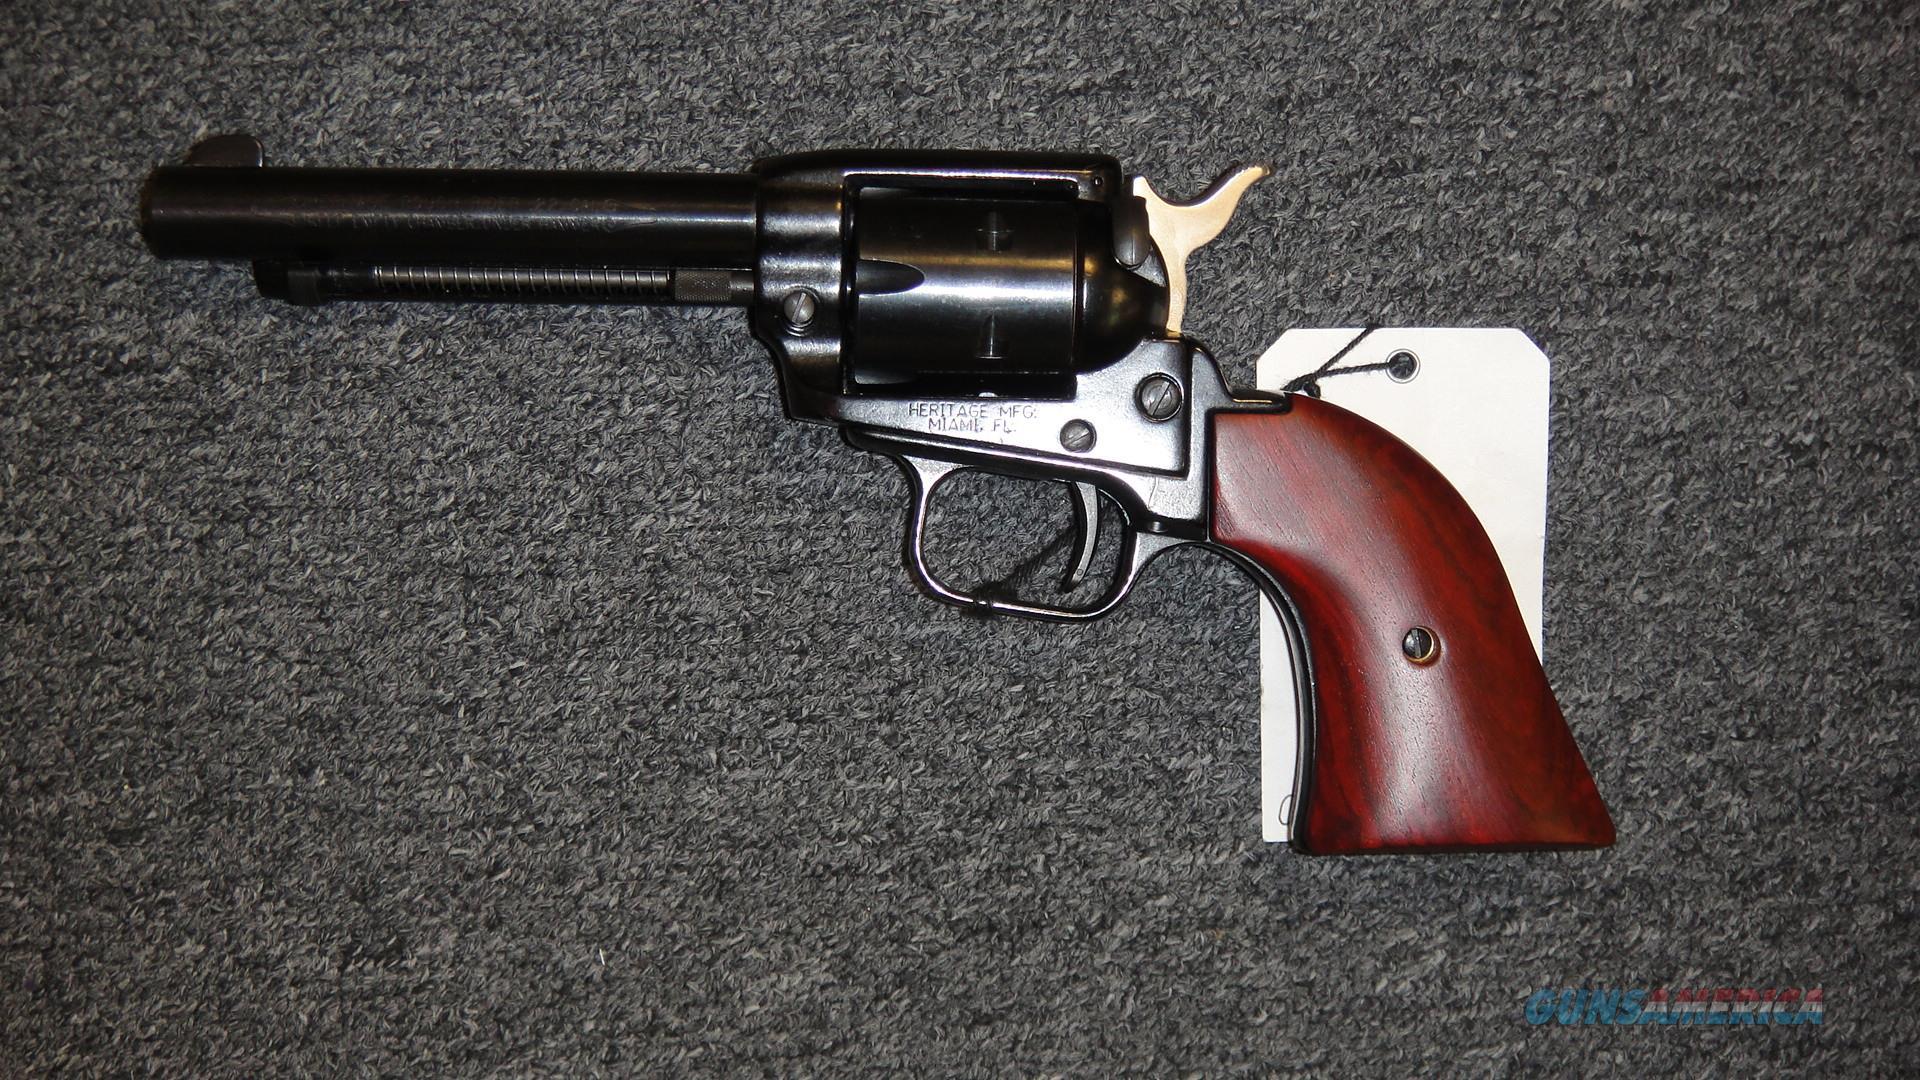 Heritage Mfg Rough Rider Convertible .22LR/.22 Mag  Guns > Pistols > Heritage